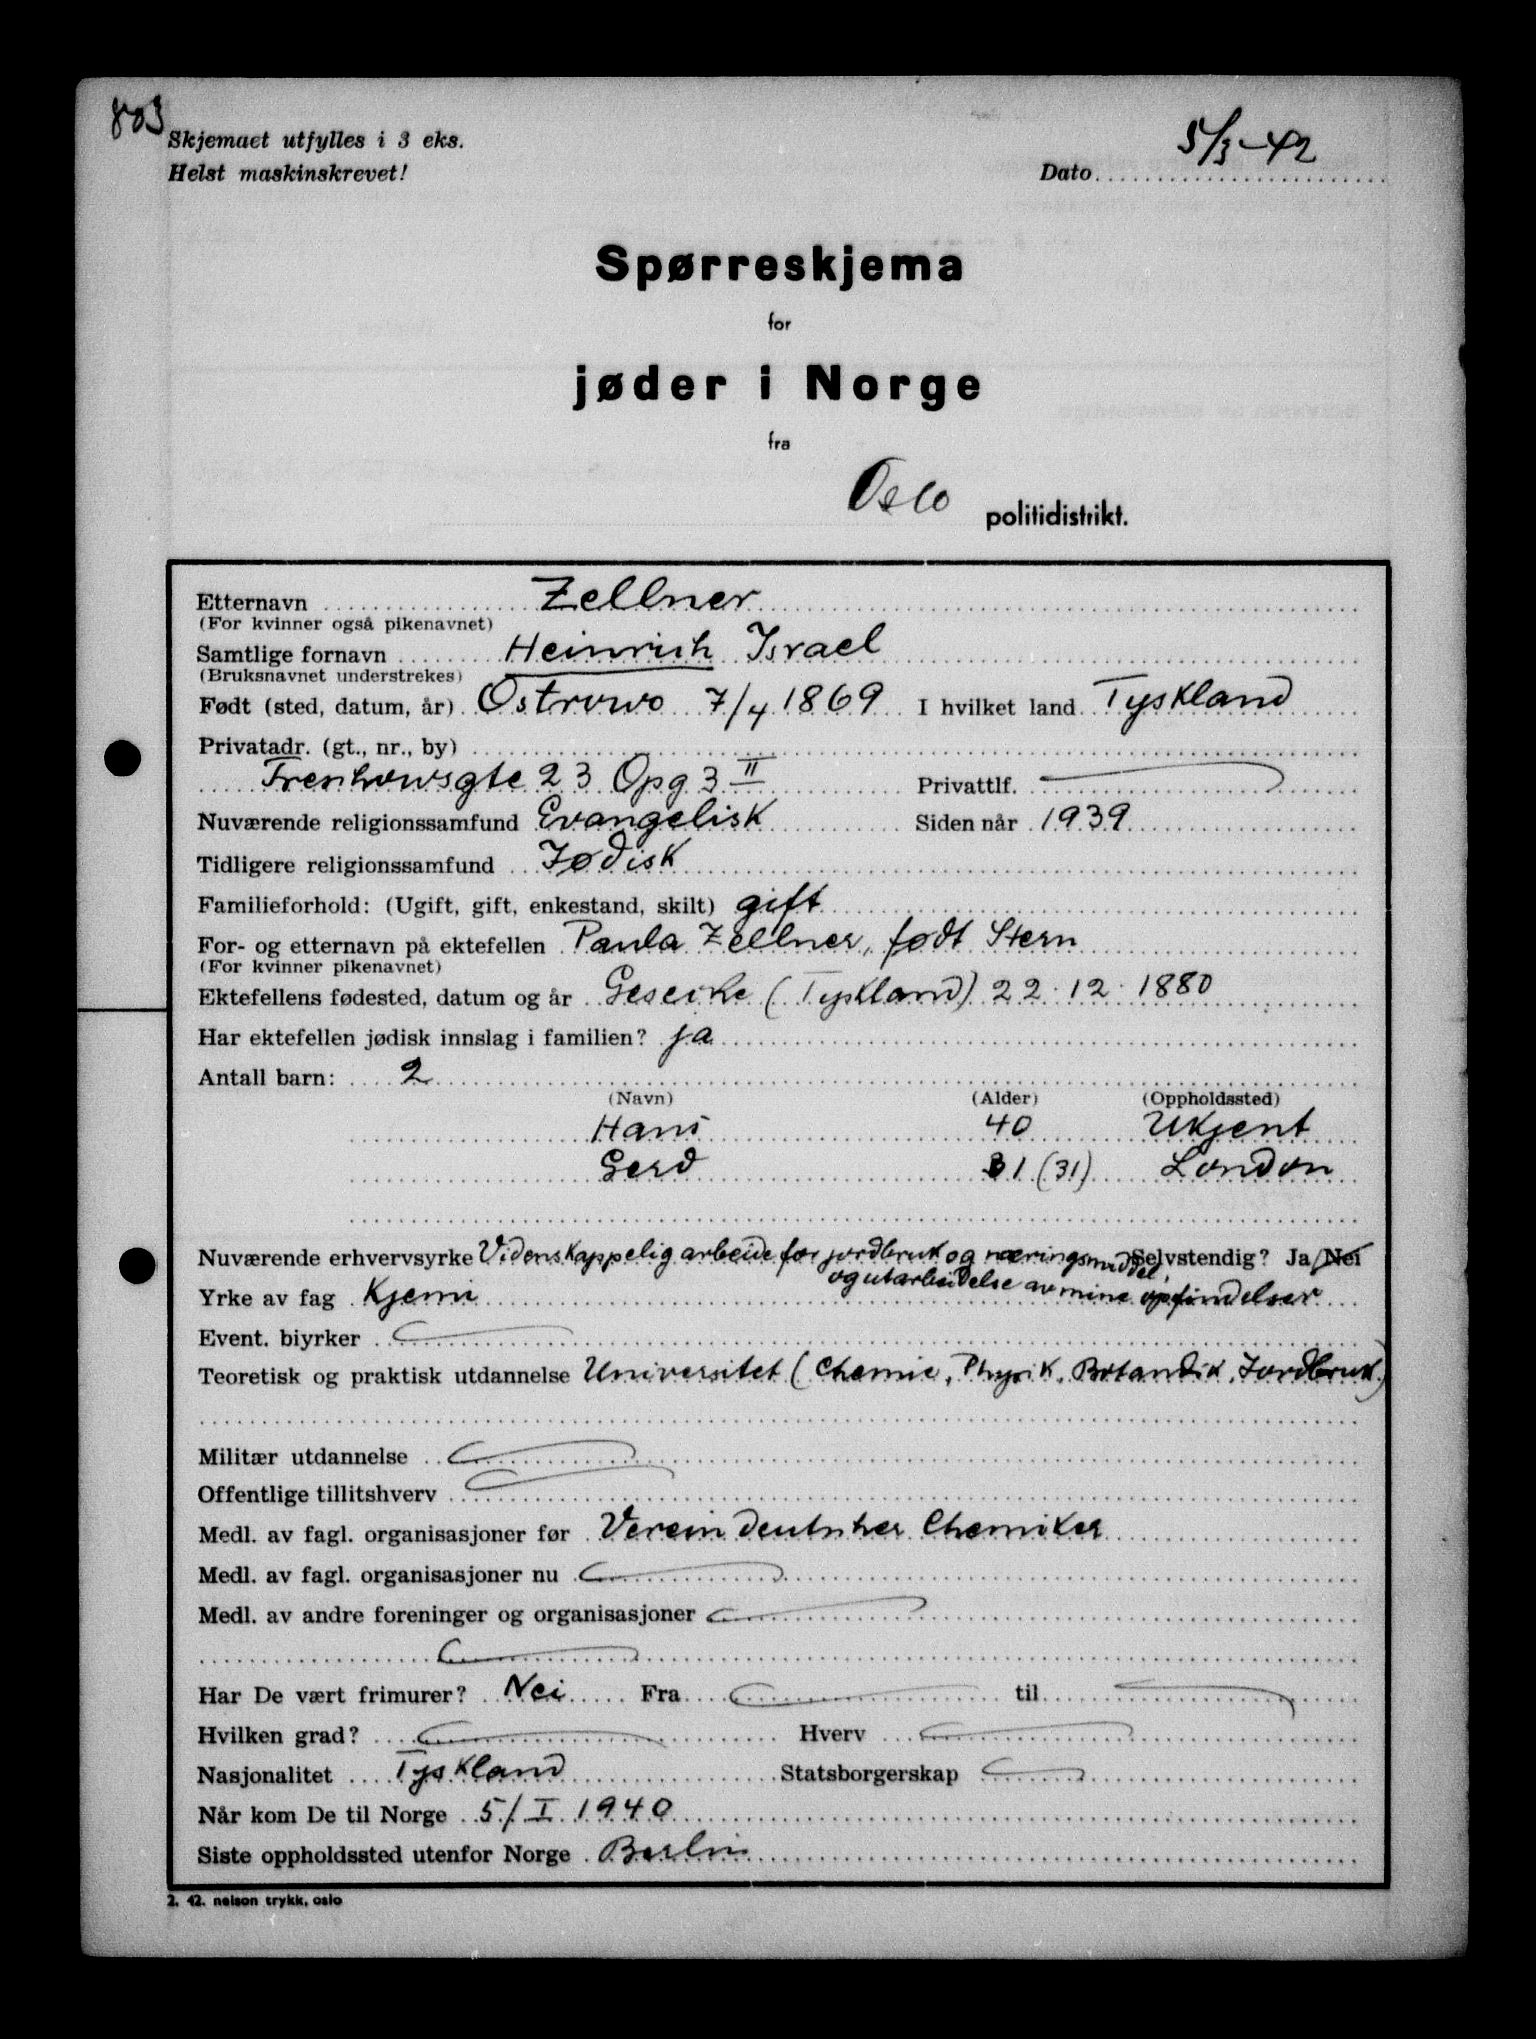 RA, Statspolitiet - Hovedkontoret / Osloavdelingen, G/Ga/L0011: Spørreskjema for jøder i Norge. 1: Oslo 610-806 (Plavnik-Zwillinger). 2: Aker 1-113 (Adler-Lewin). , 1942, s. 192